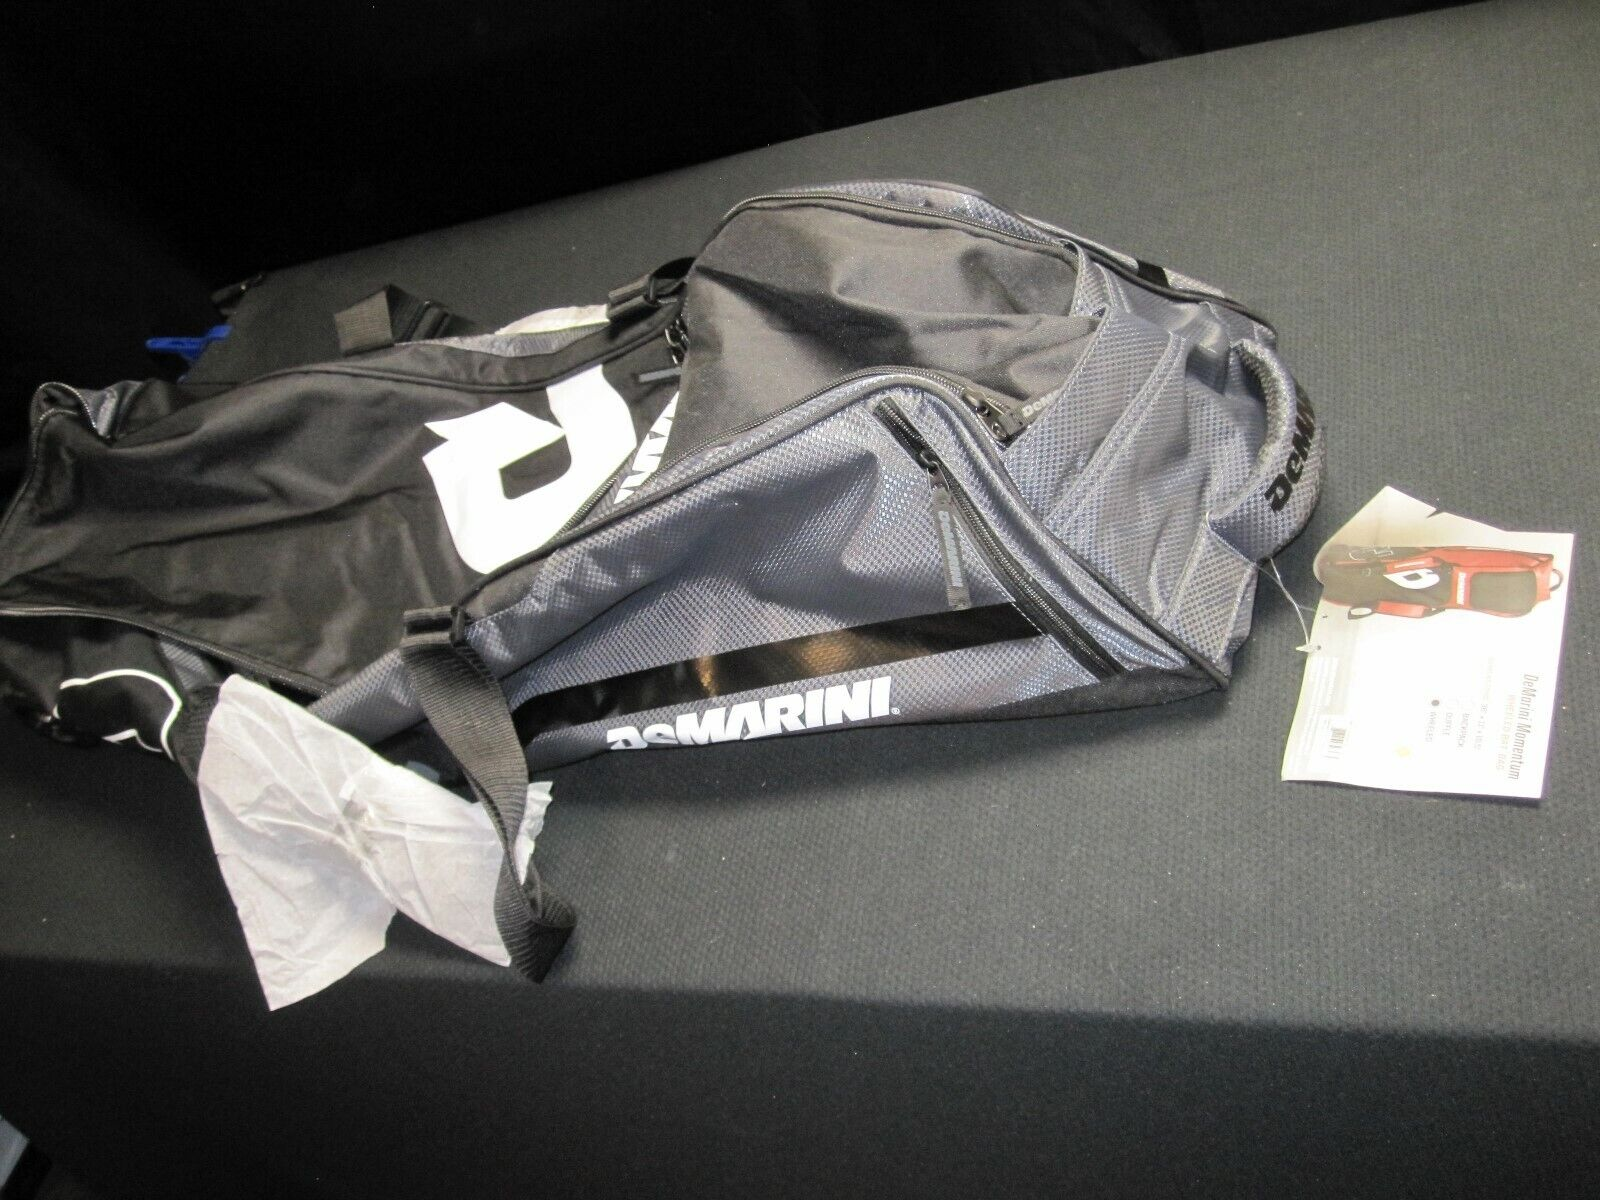 DeMarini Momentum Baseball/Softball Wheel Bag - Charcoal